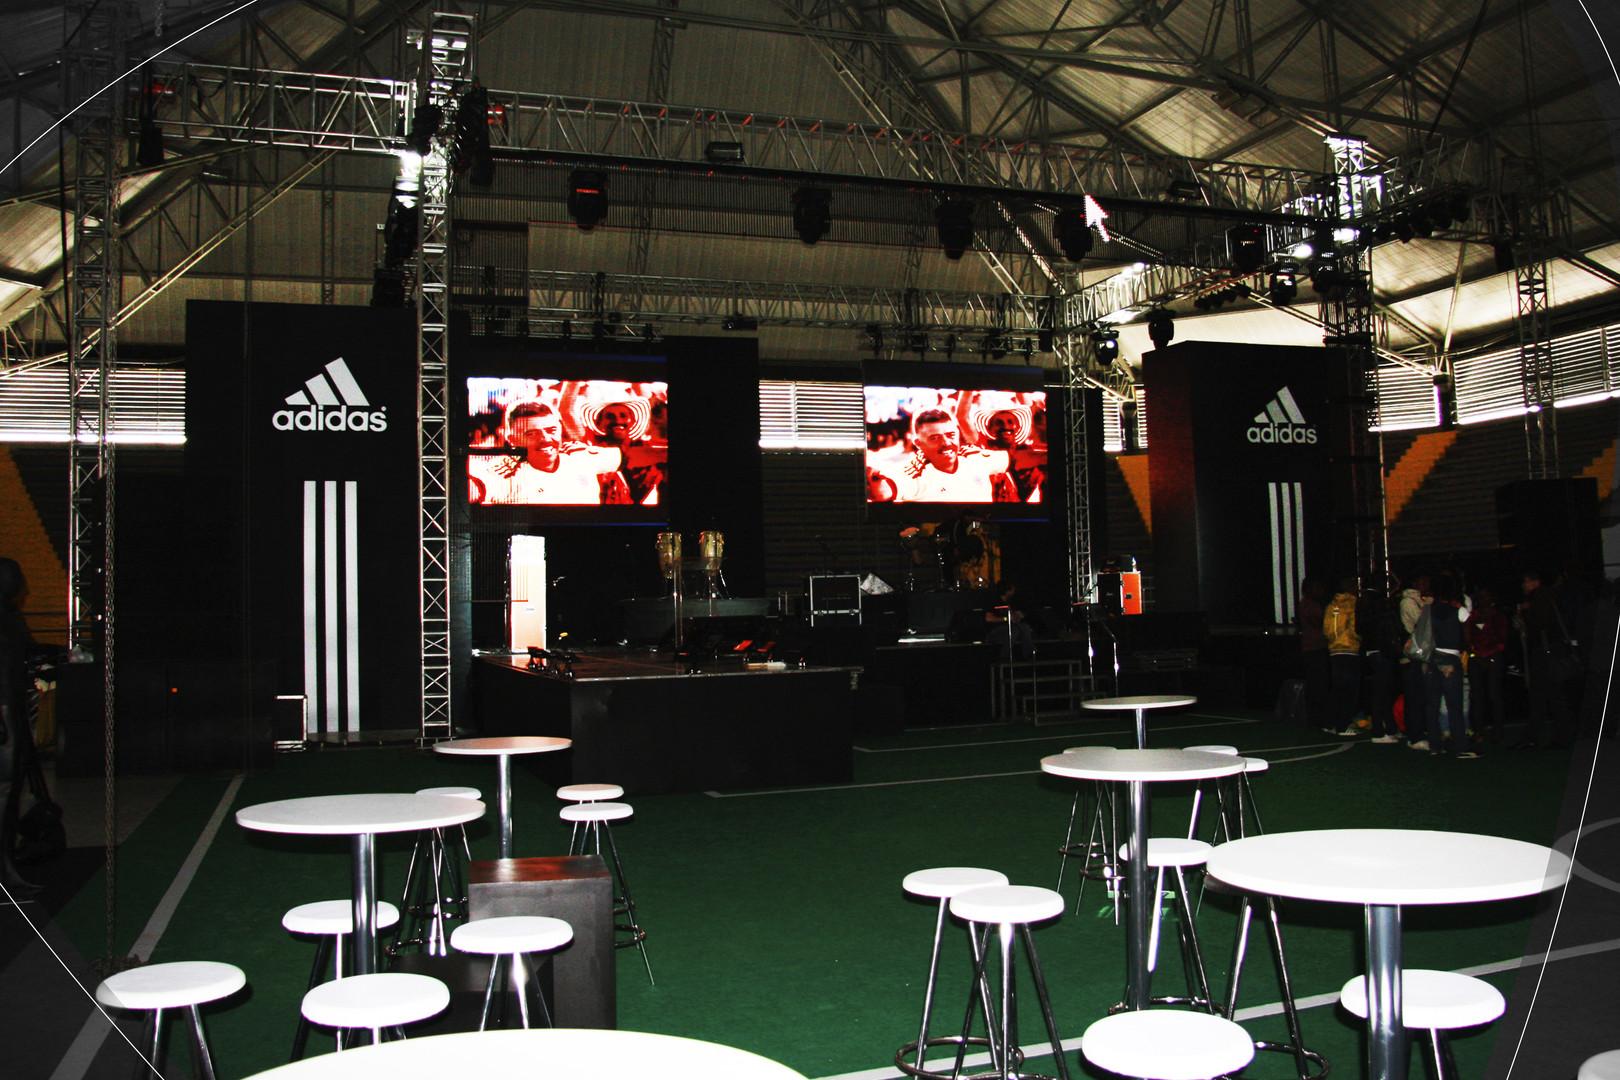 Adidas IMG_6841.JPG